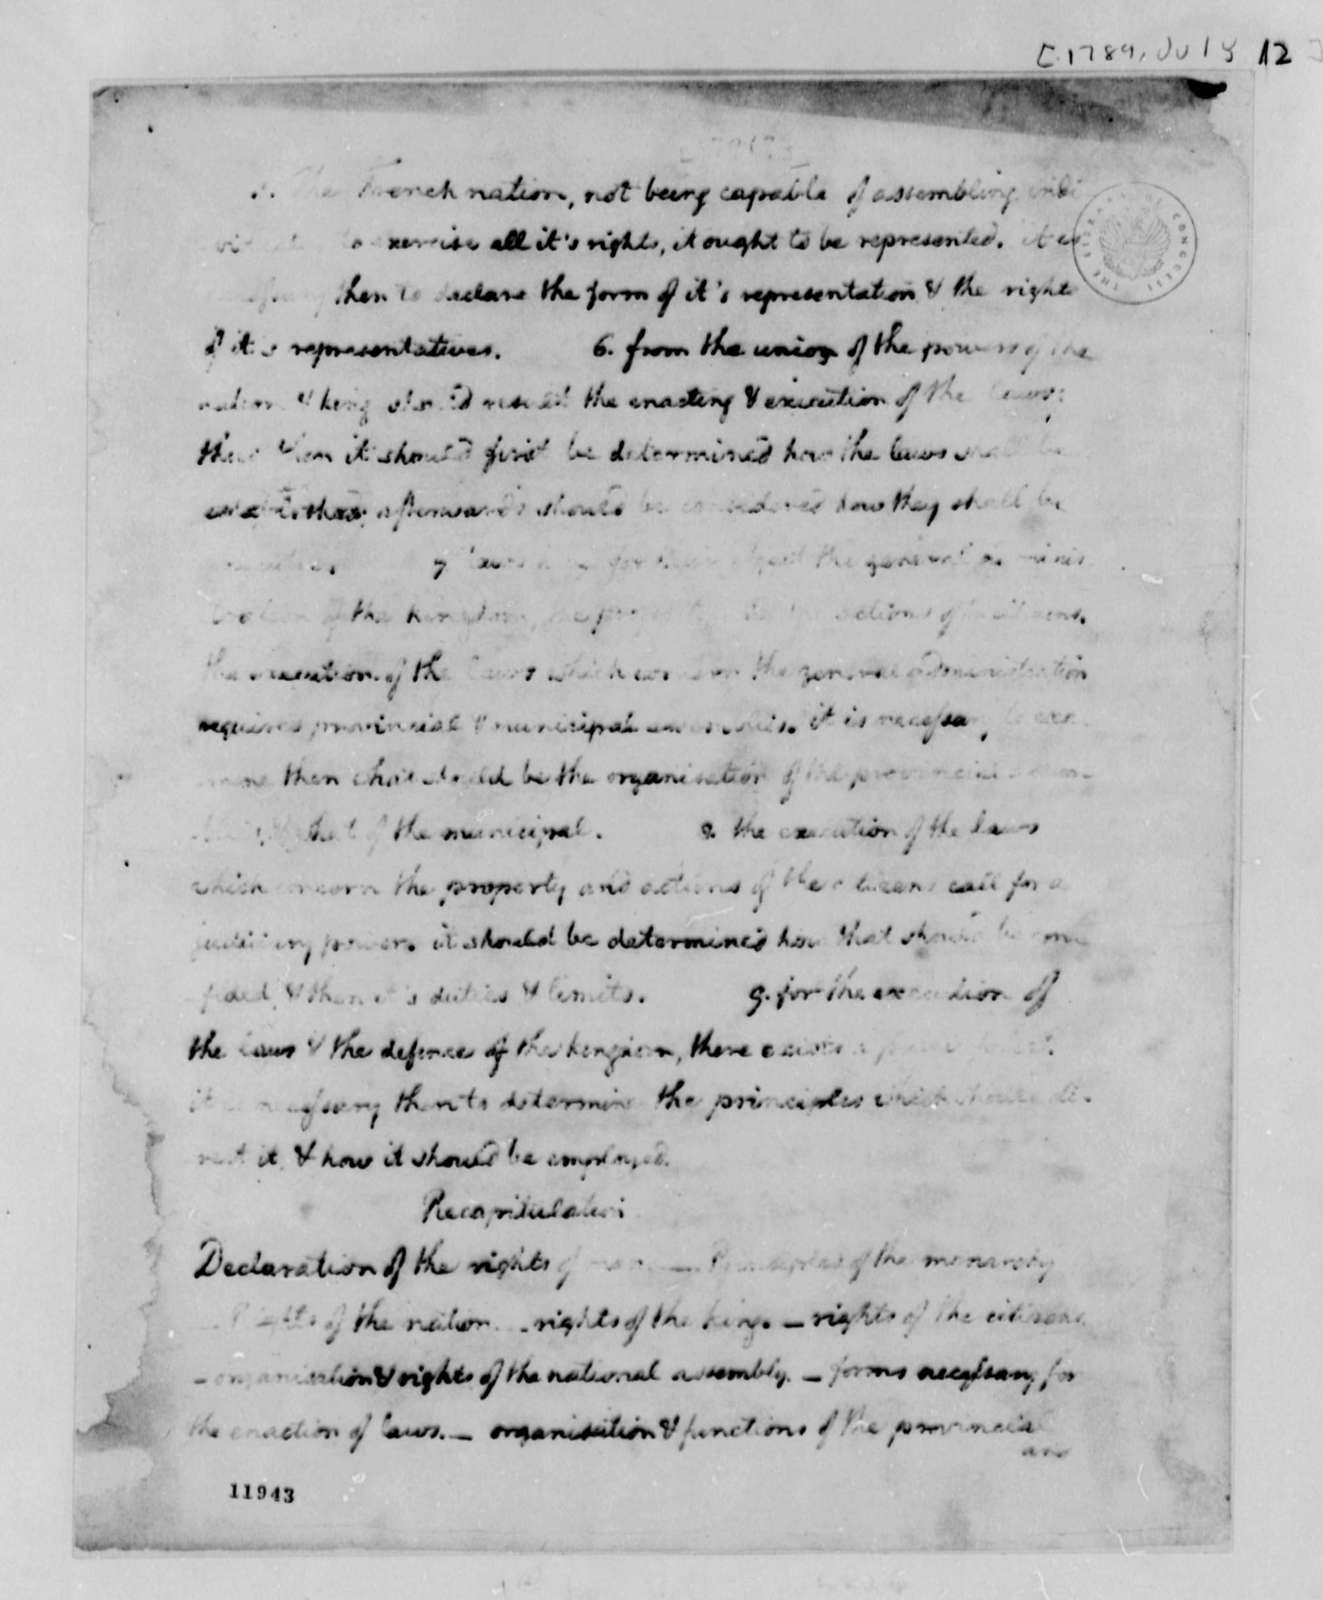 Thomas Jefferson to Richard Price, July 12, 1789